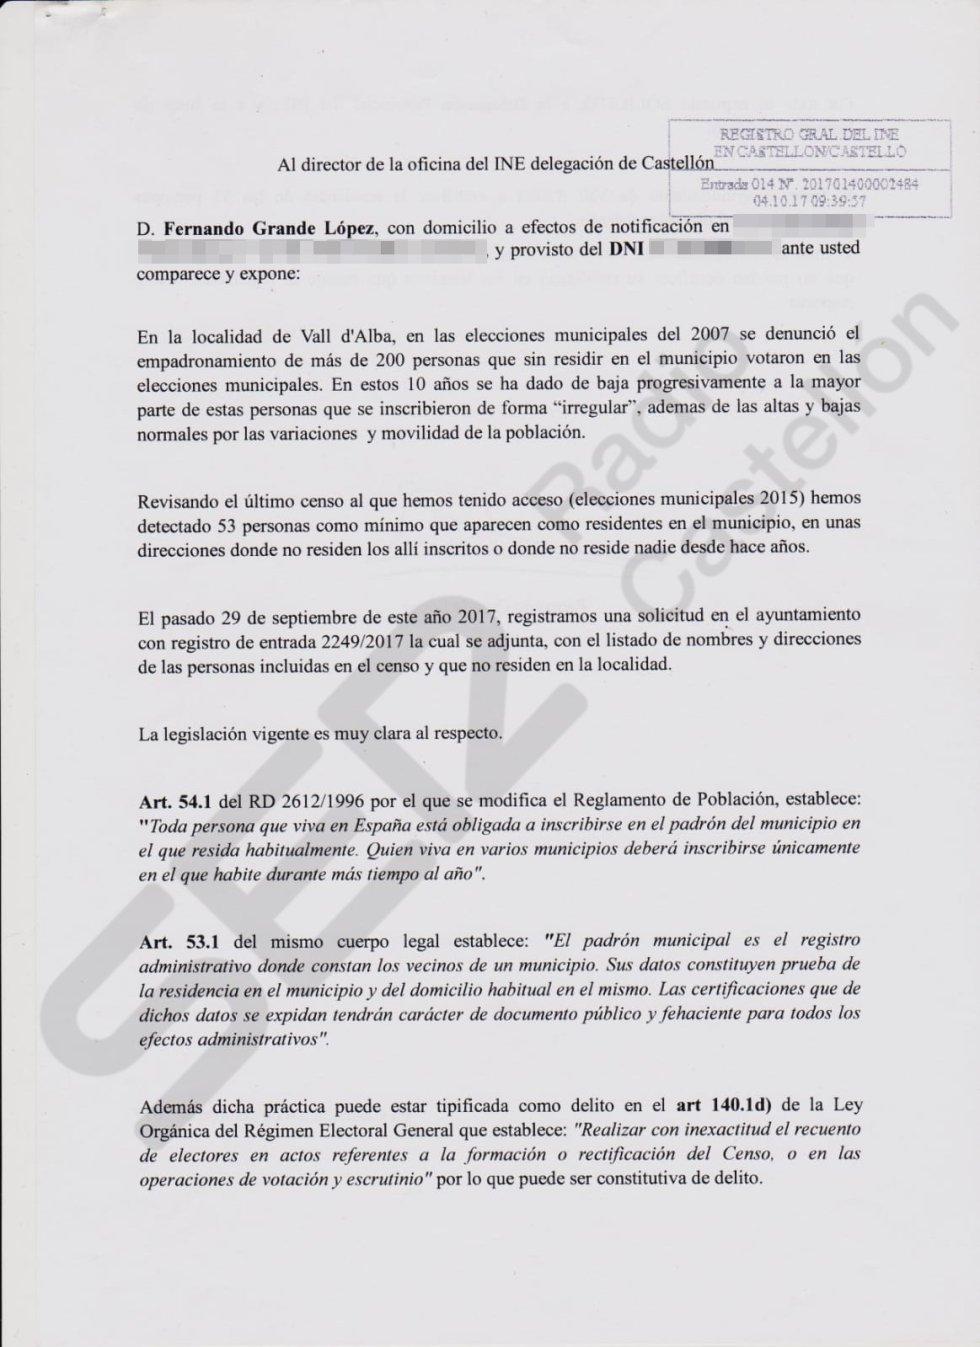 Datos sobre los residentes empadronados de forma irregular en viviendas de Vall d'Alba